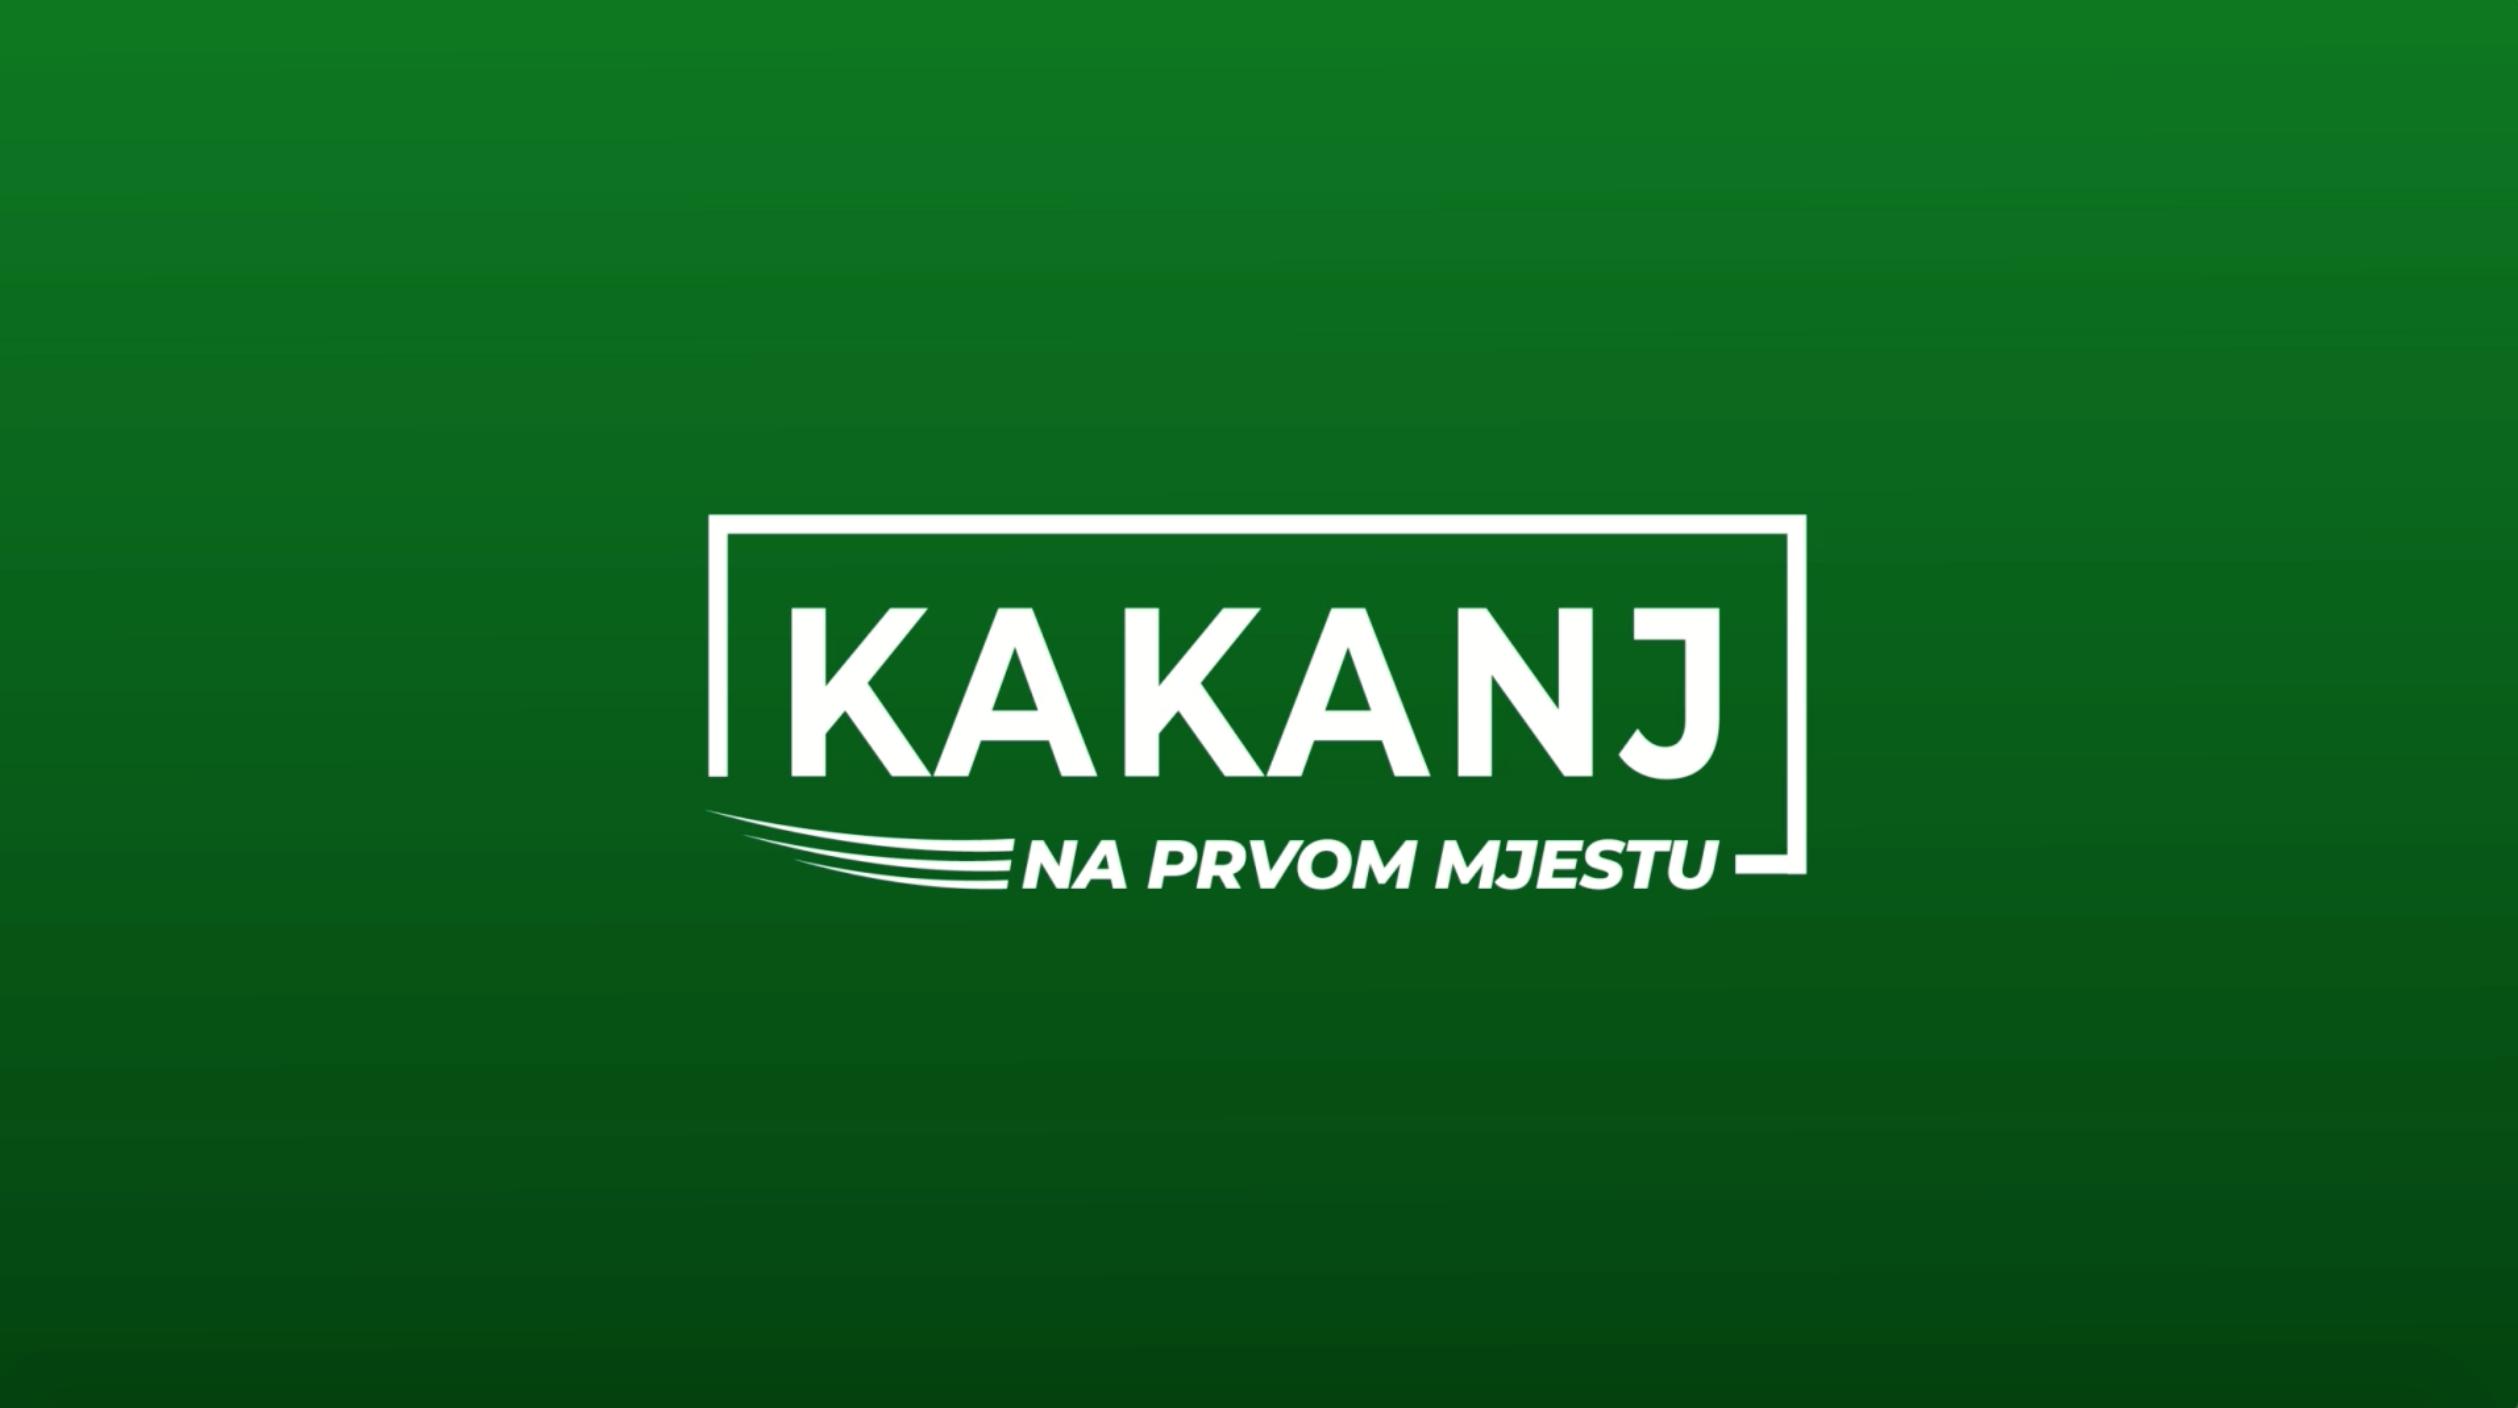 Saopštenje SDA Kakanj – Održavanje predizbornih skupova